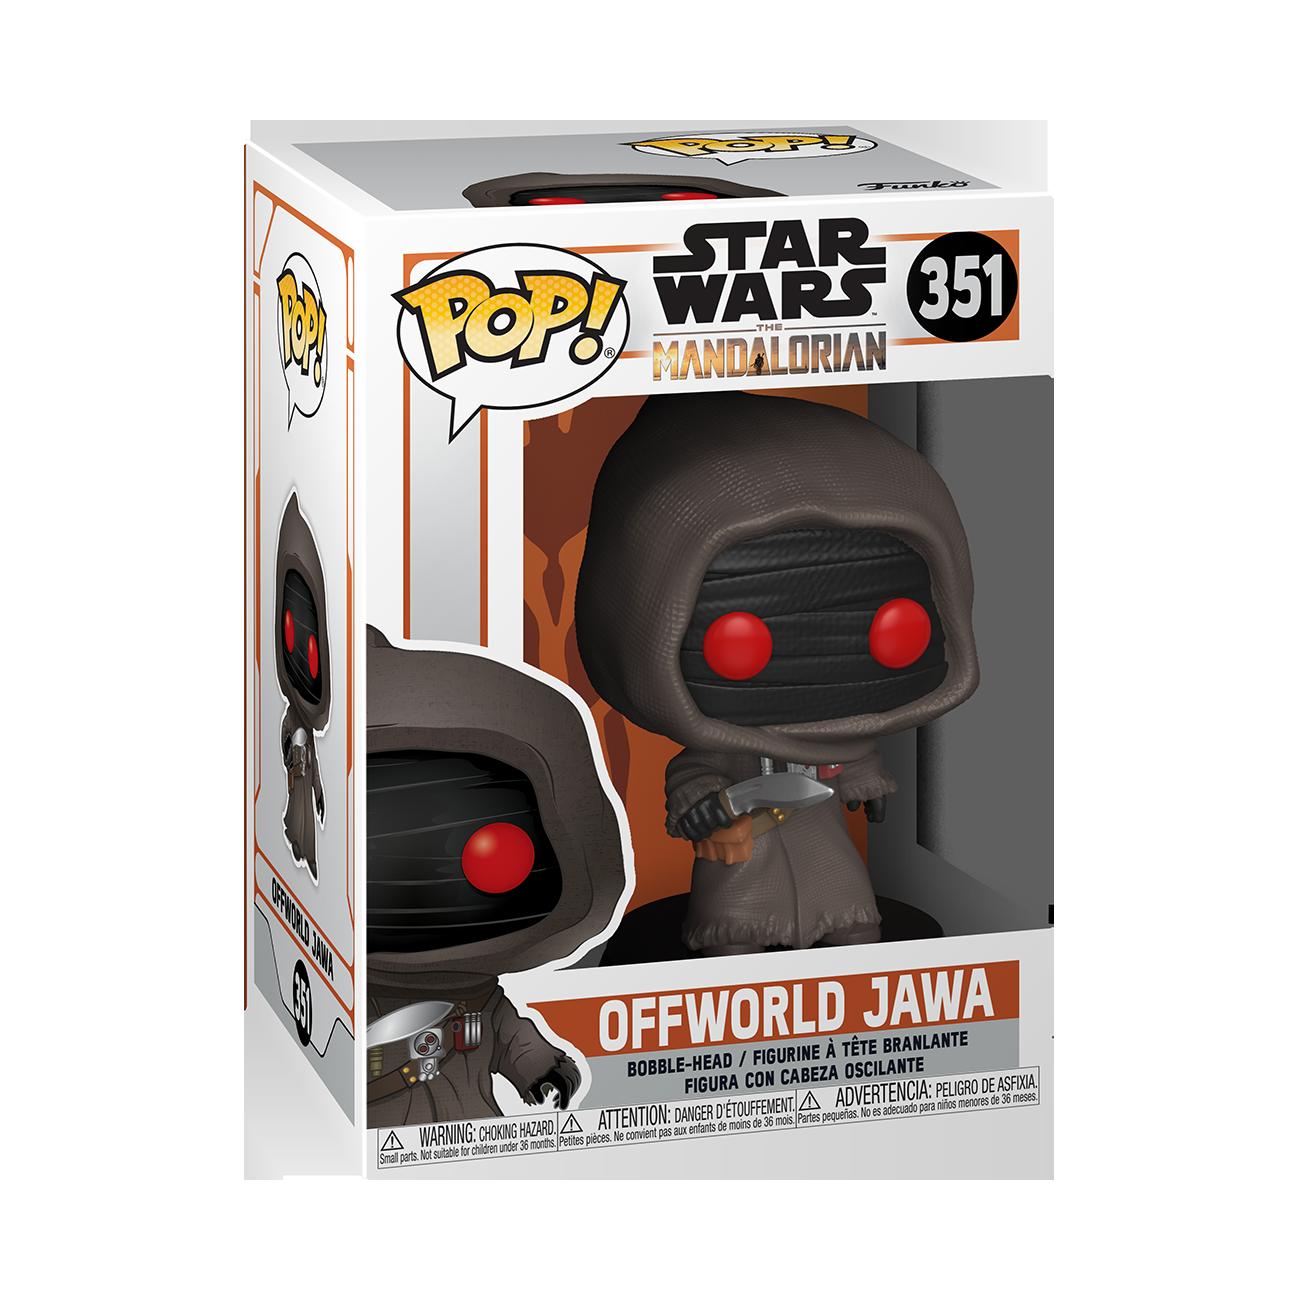 Star Wars: The Mandalorian - Offworld Jawa Pop! Vinyl Figure image